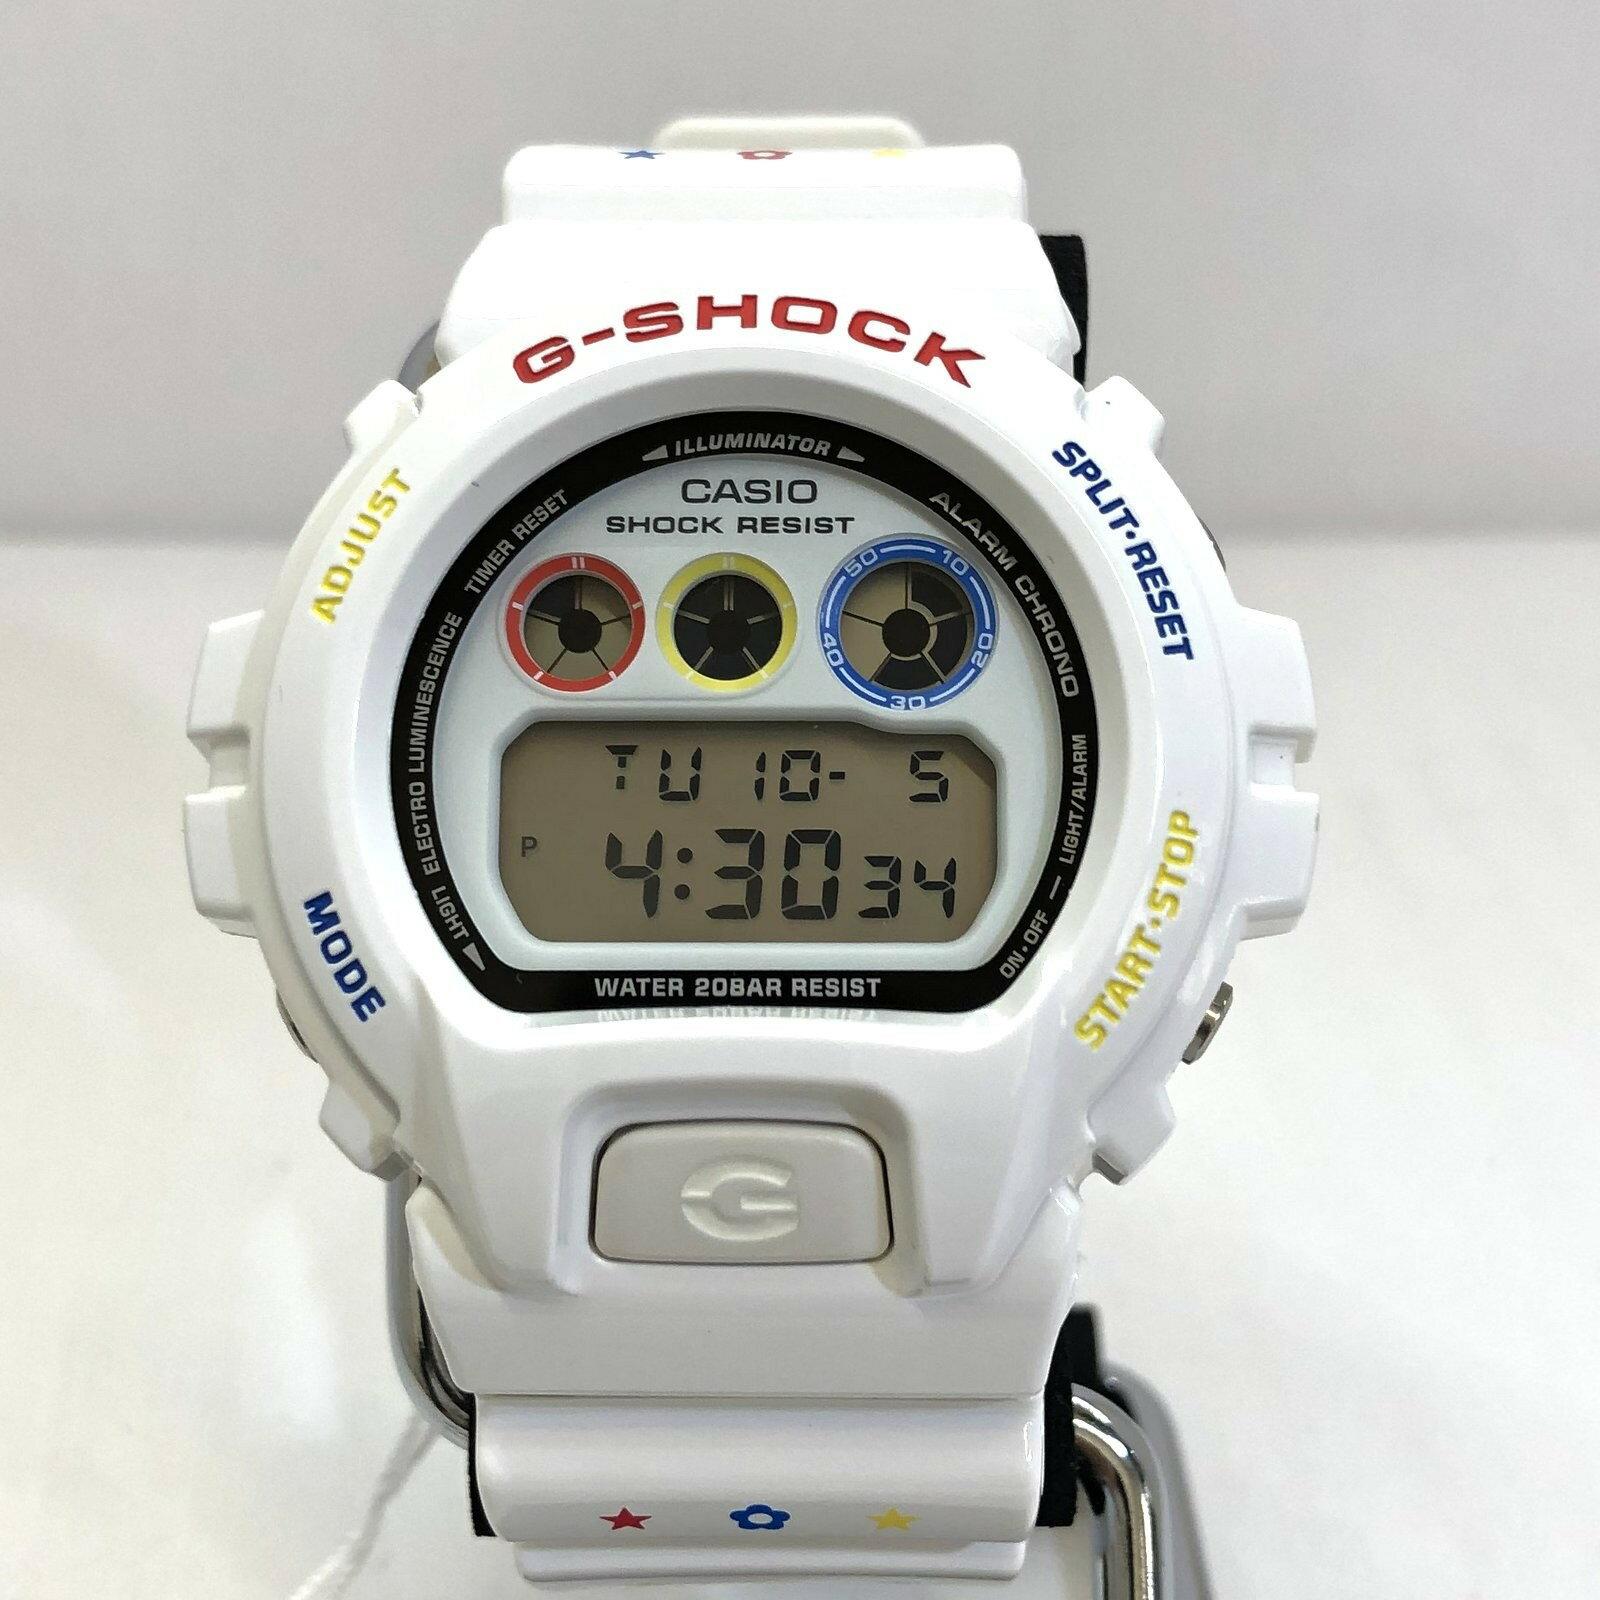 腕時計, メンズ腕時計 G-SHOCK CASIO DW-6900MT-7JR 30 MEDICOM TOY BERBRICK T ITBROZVHKDDW RY5378